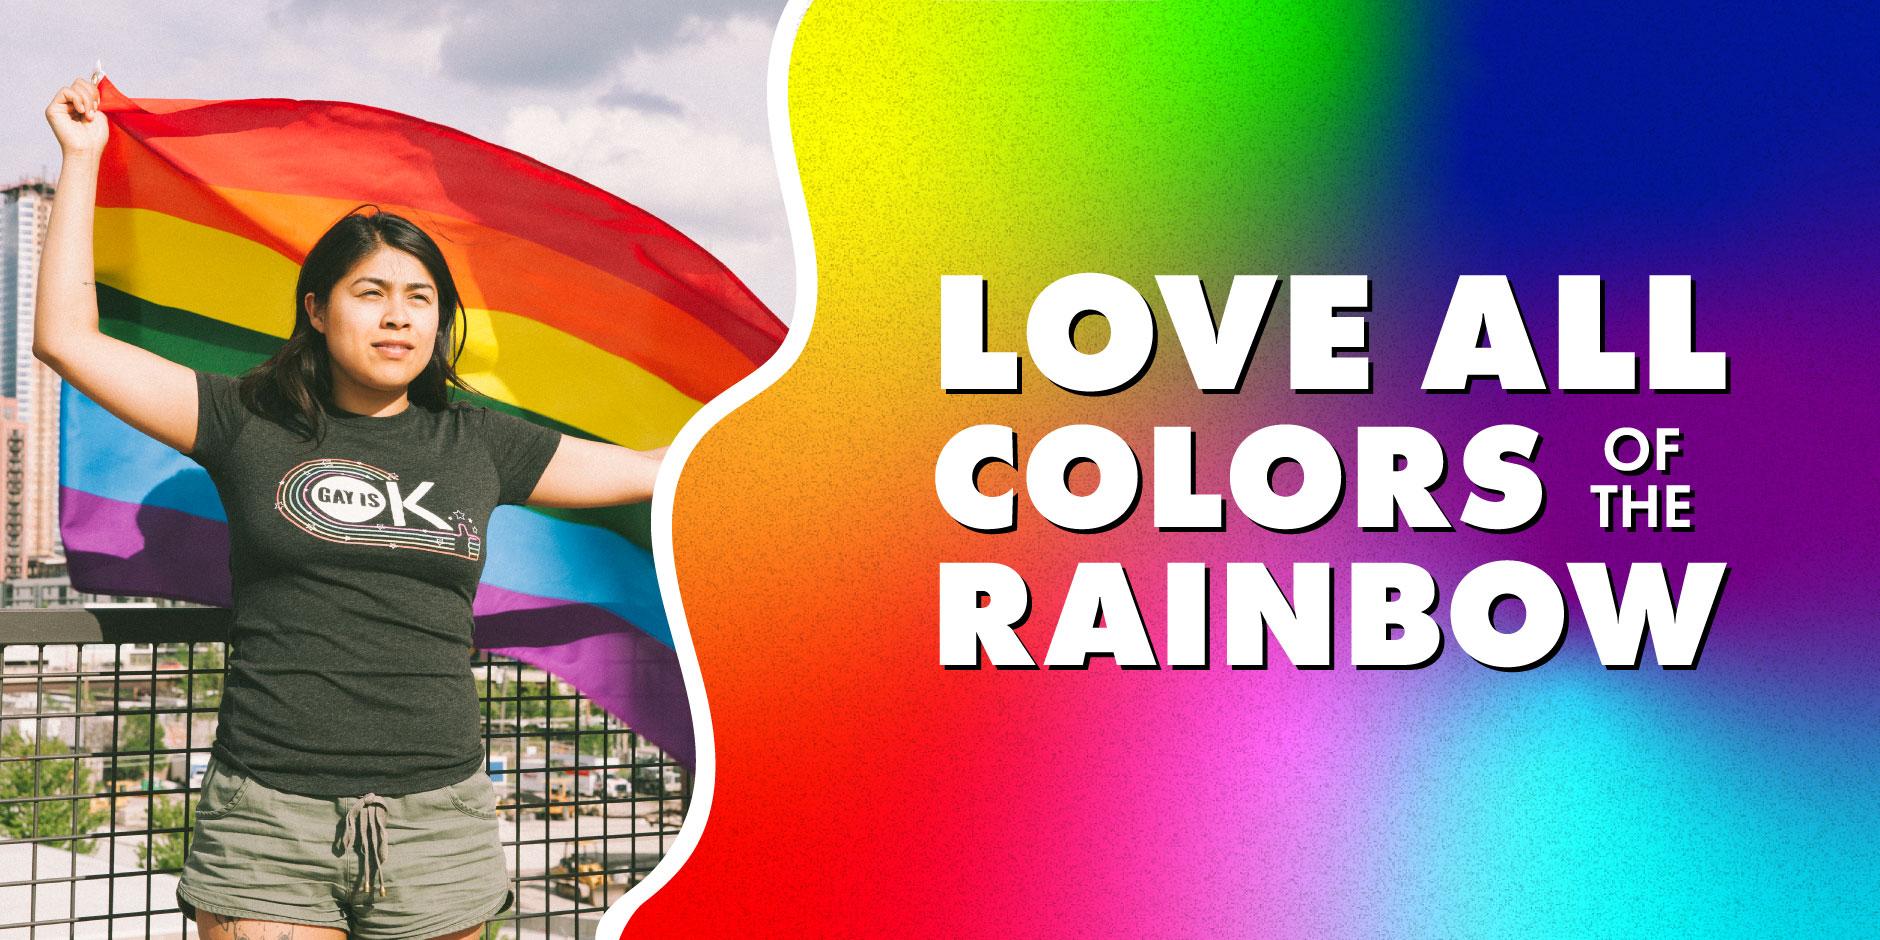 Celebrate Pride everyday at Threadless